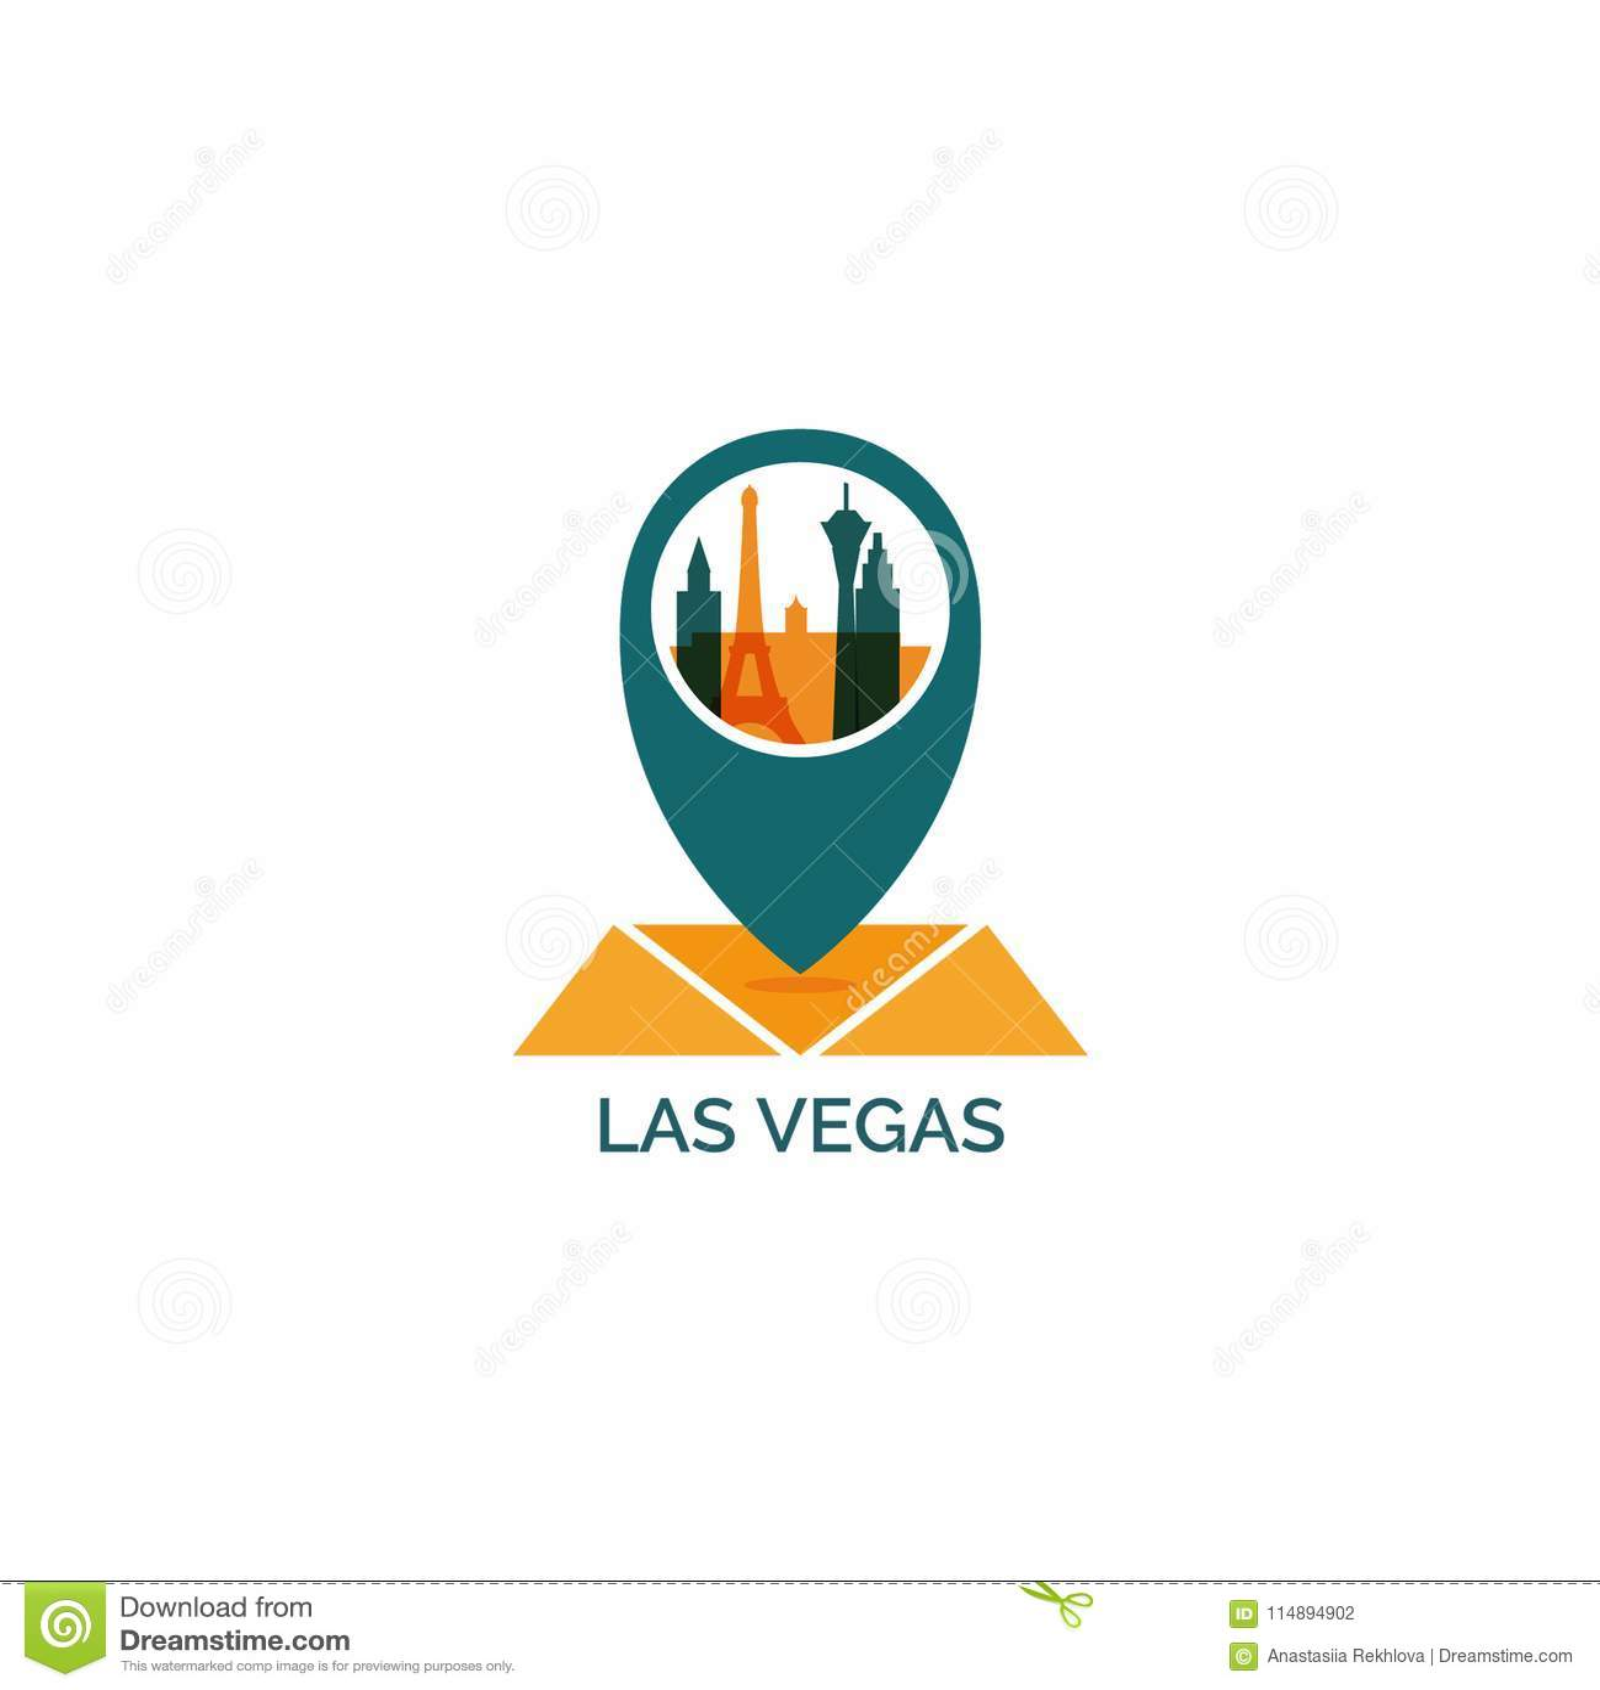 Las Vegas City Skyline Silhouette Vector Logo Illustration Stock ...